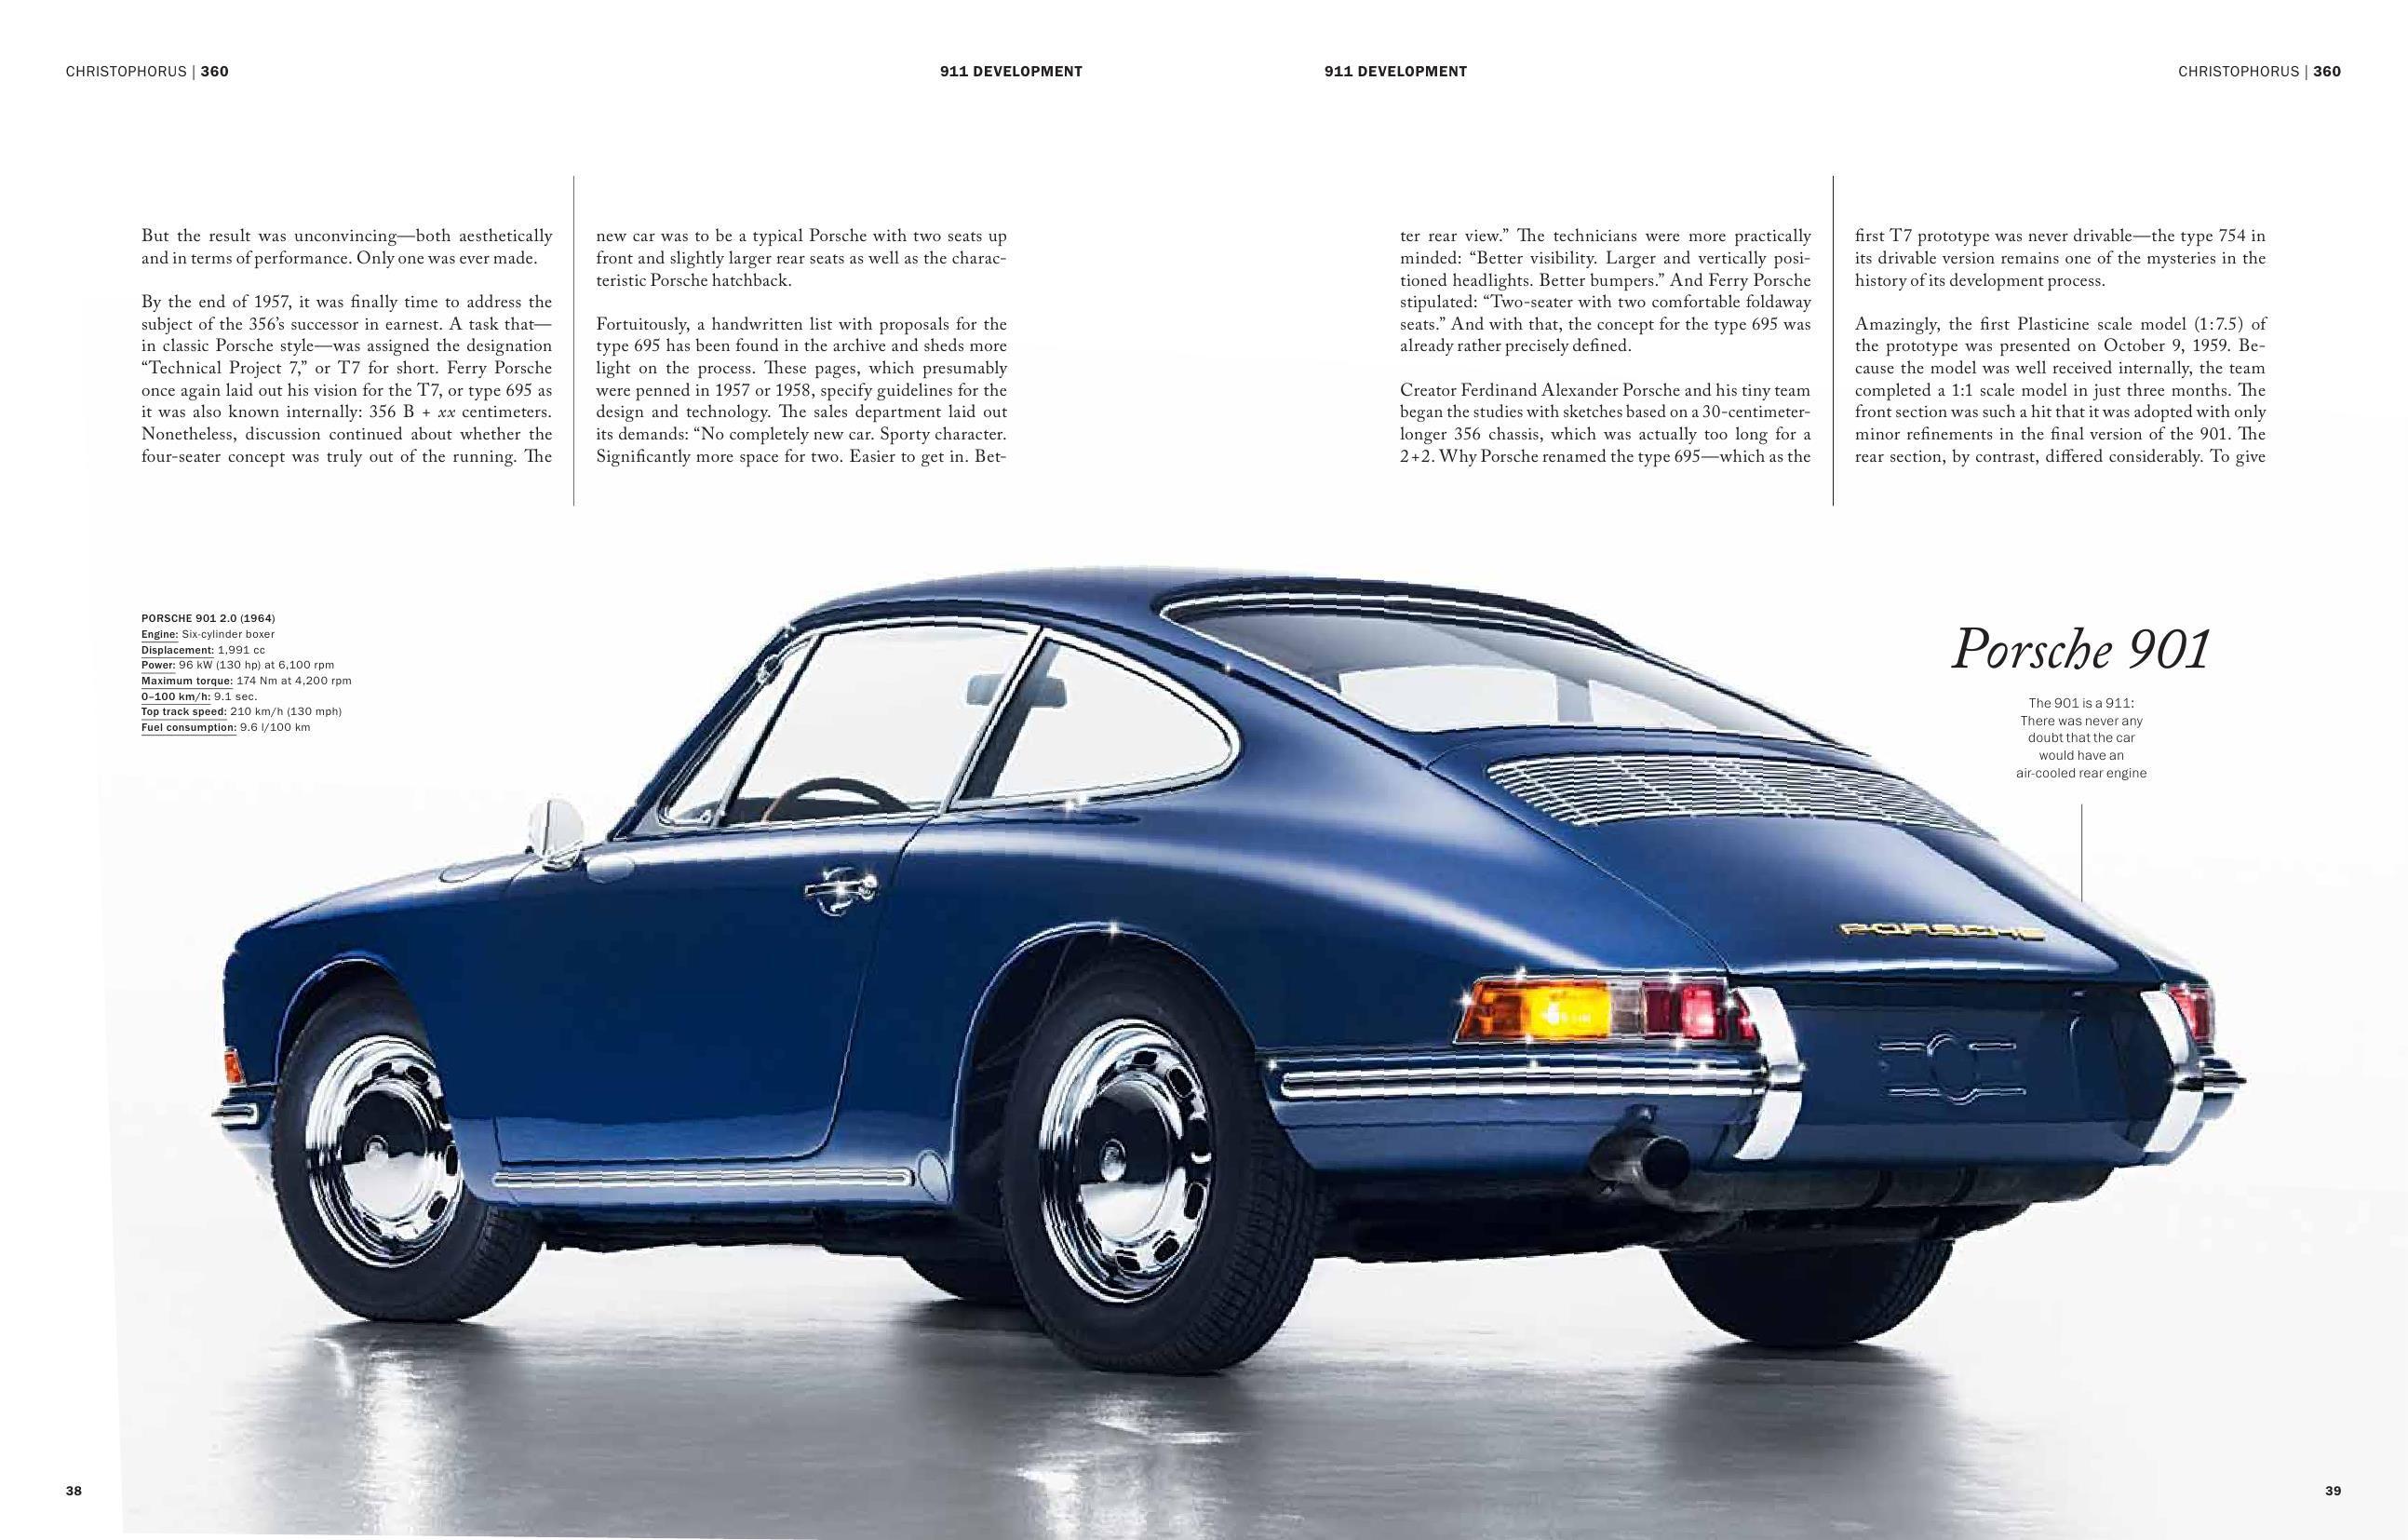 Porsche 901 Development Christophorus Mag